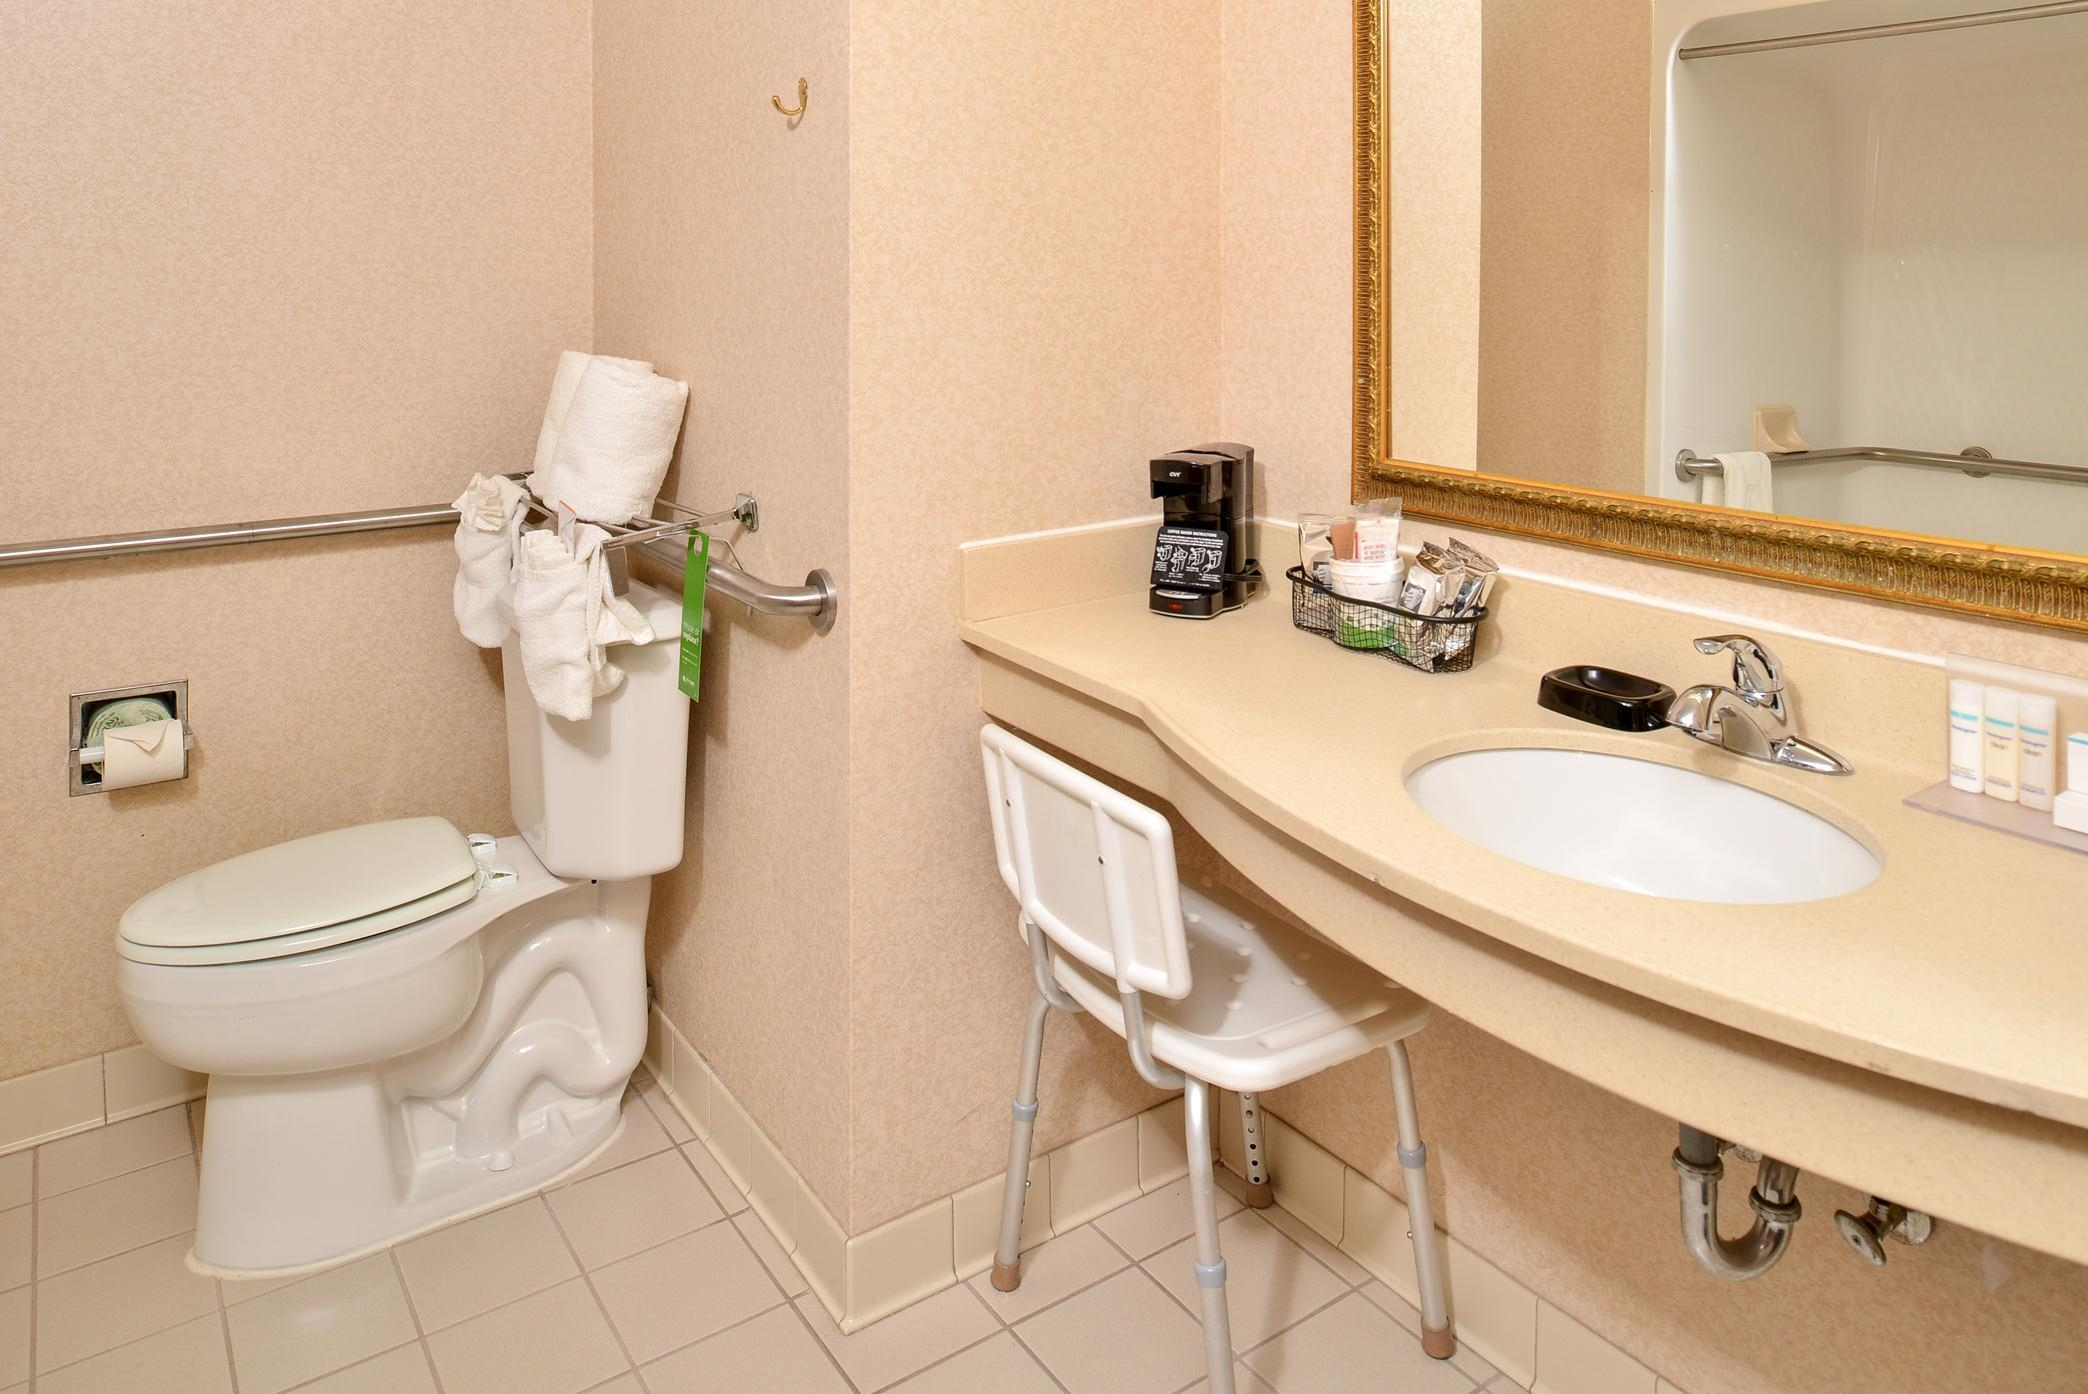 Accessible Guest Room Bathroom